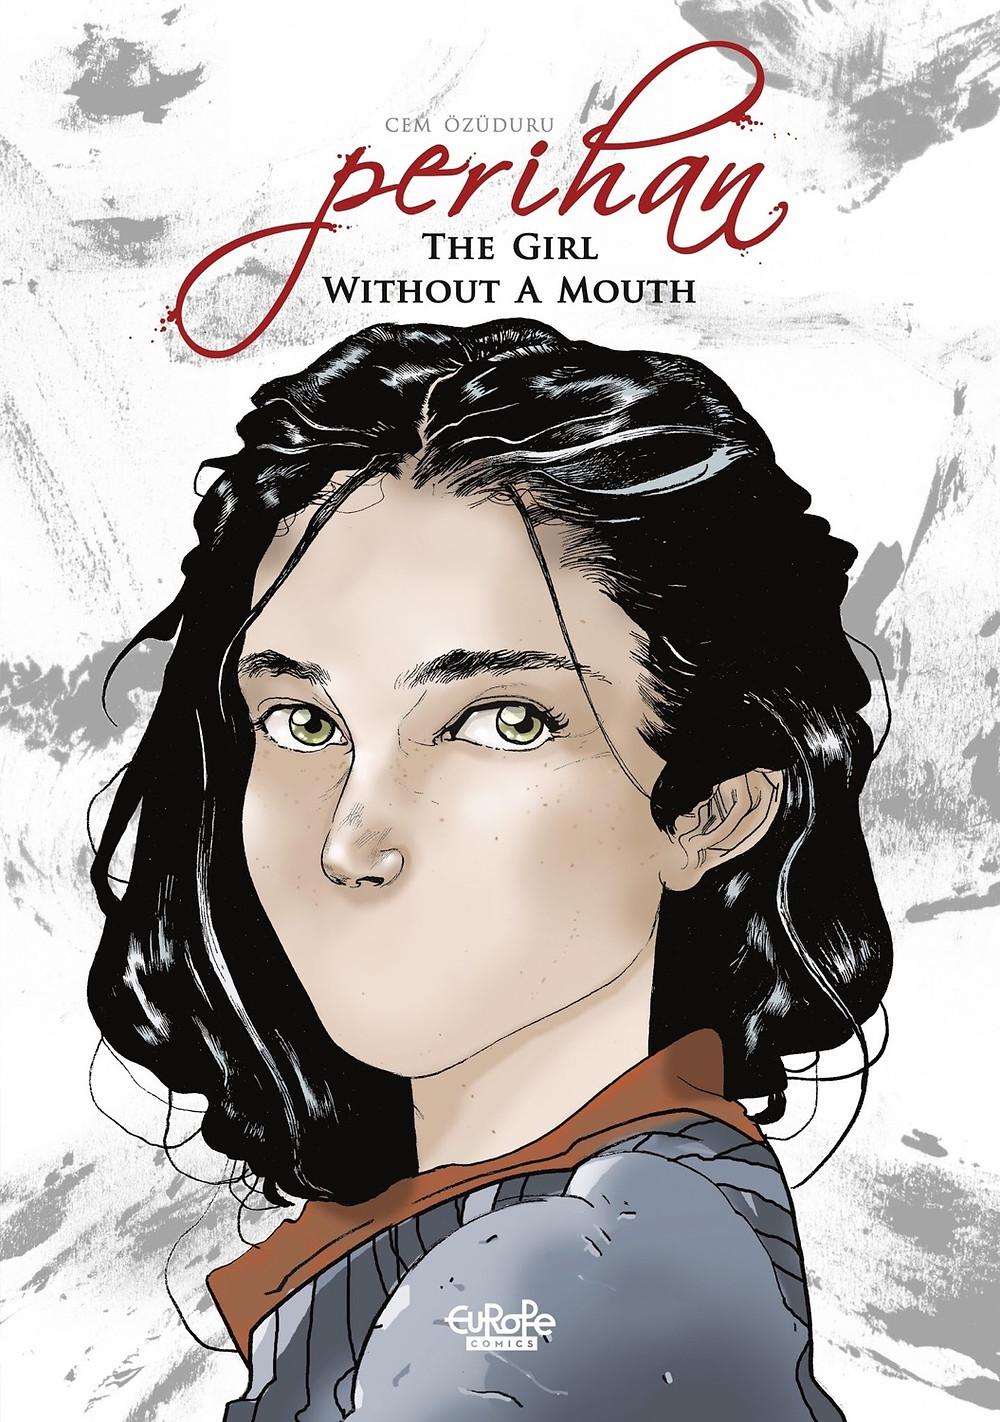 Published by Marmara Cizgi, Europe Comics